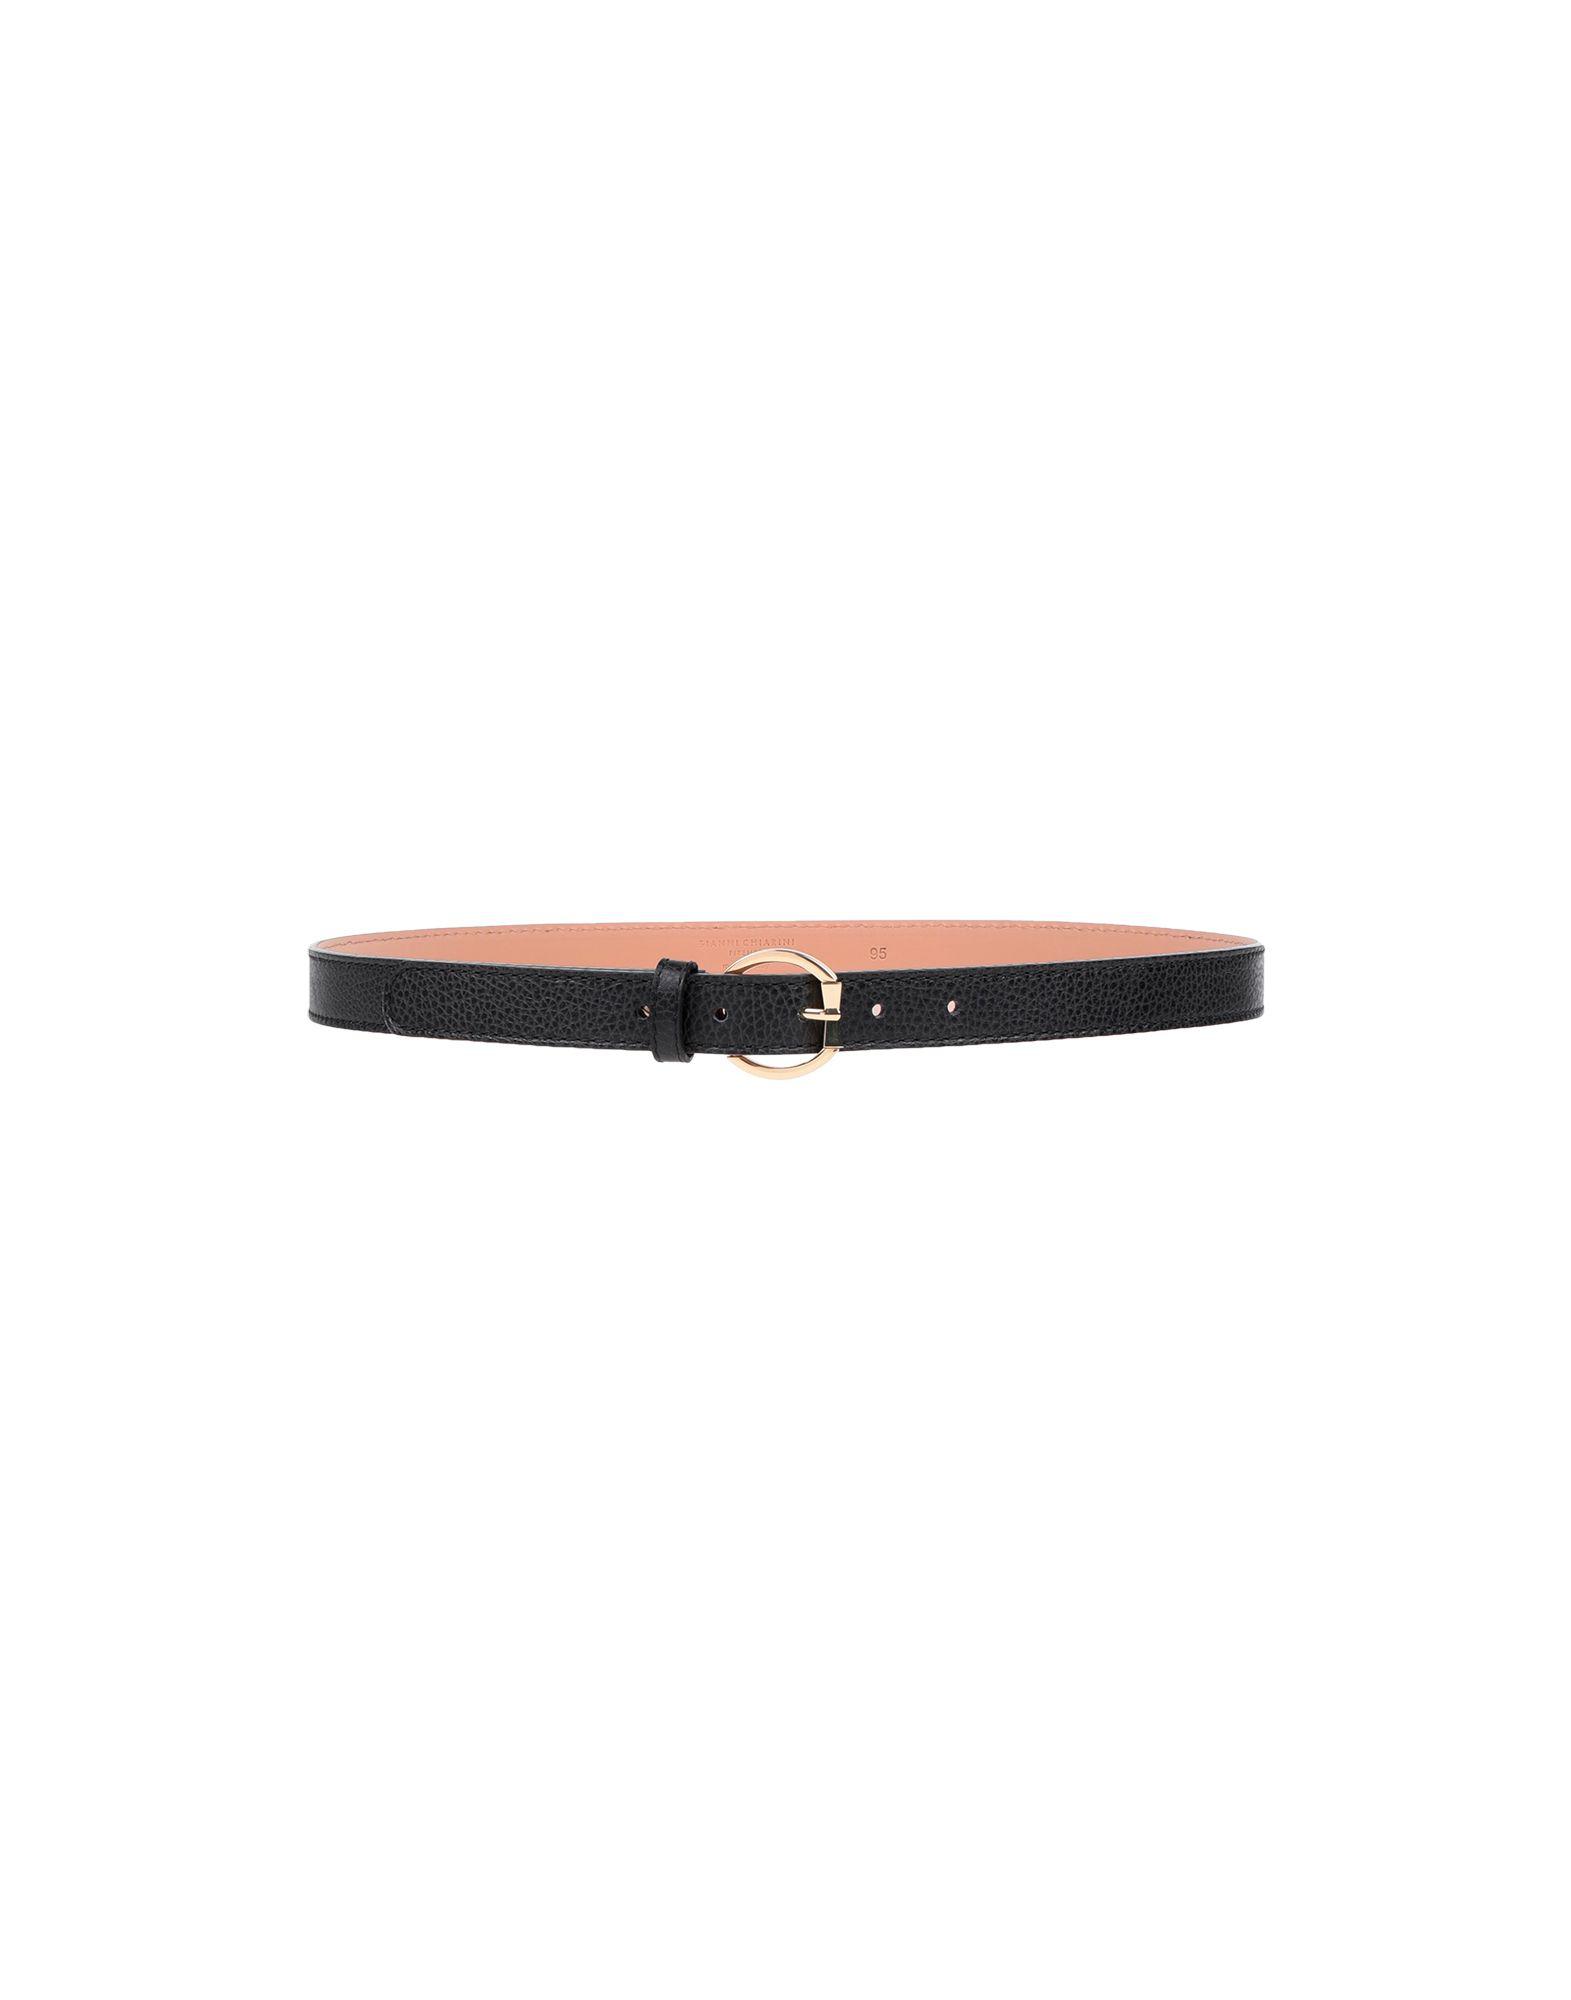 Gianni Chiarini Thin Belt In Black